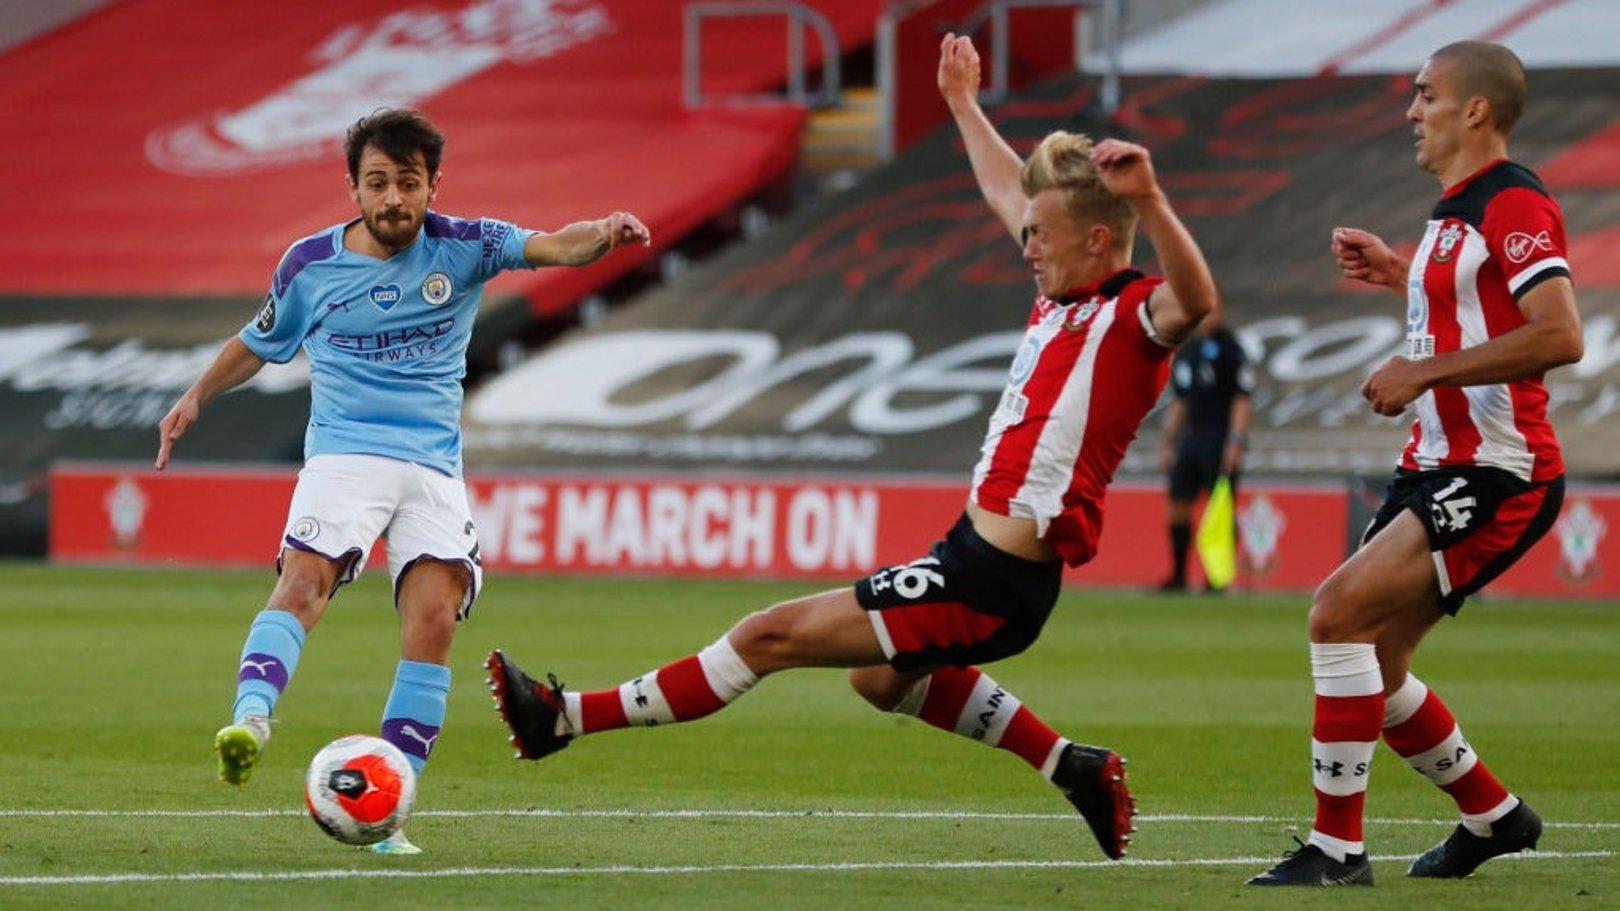 SILVA STRIKE: Bernardo tries his luck